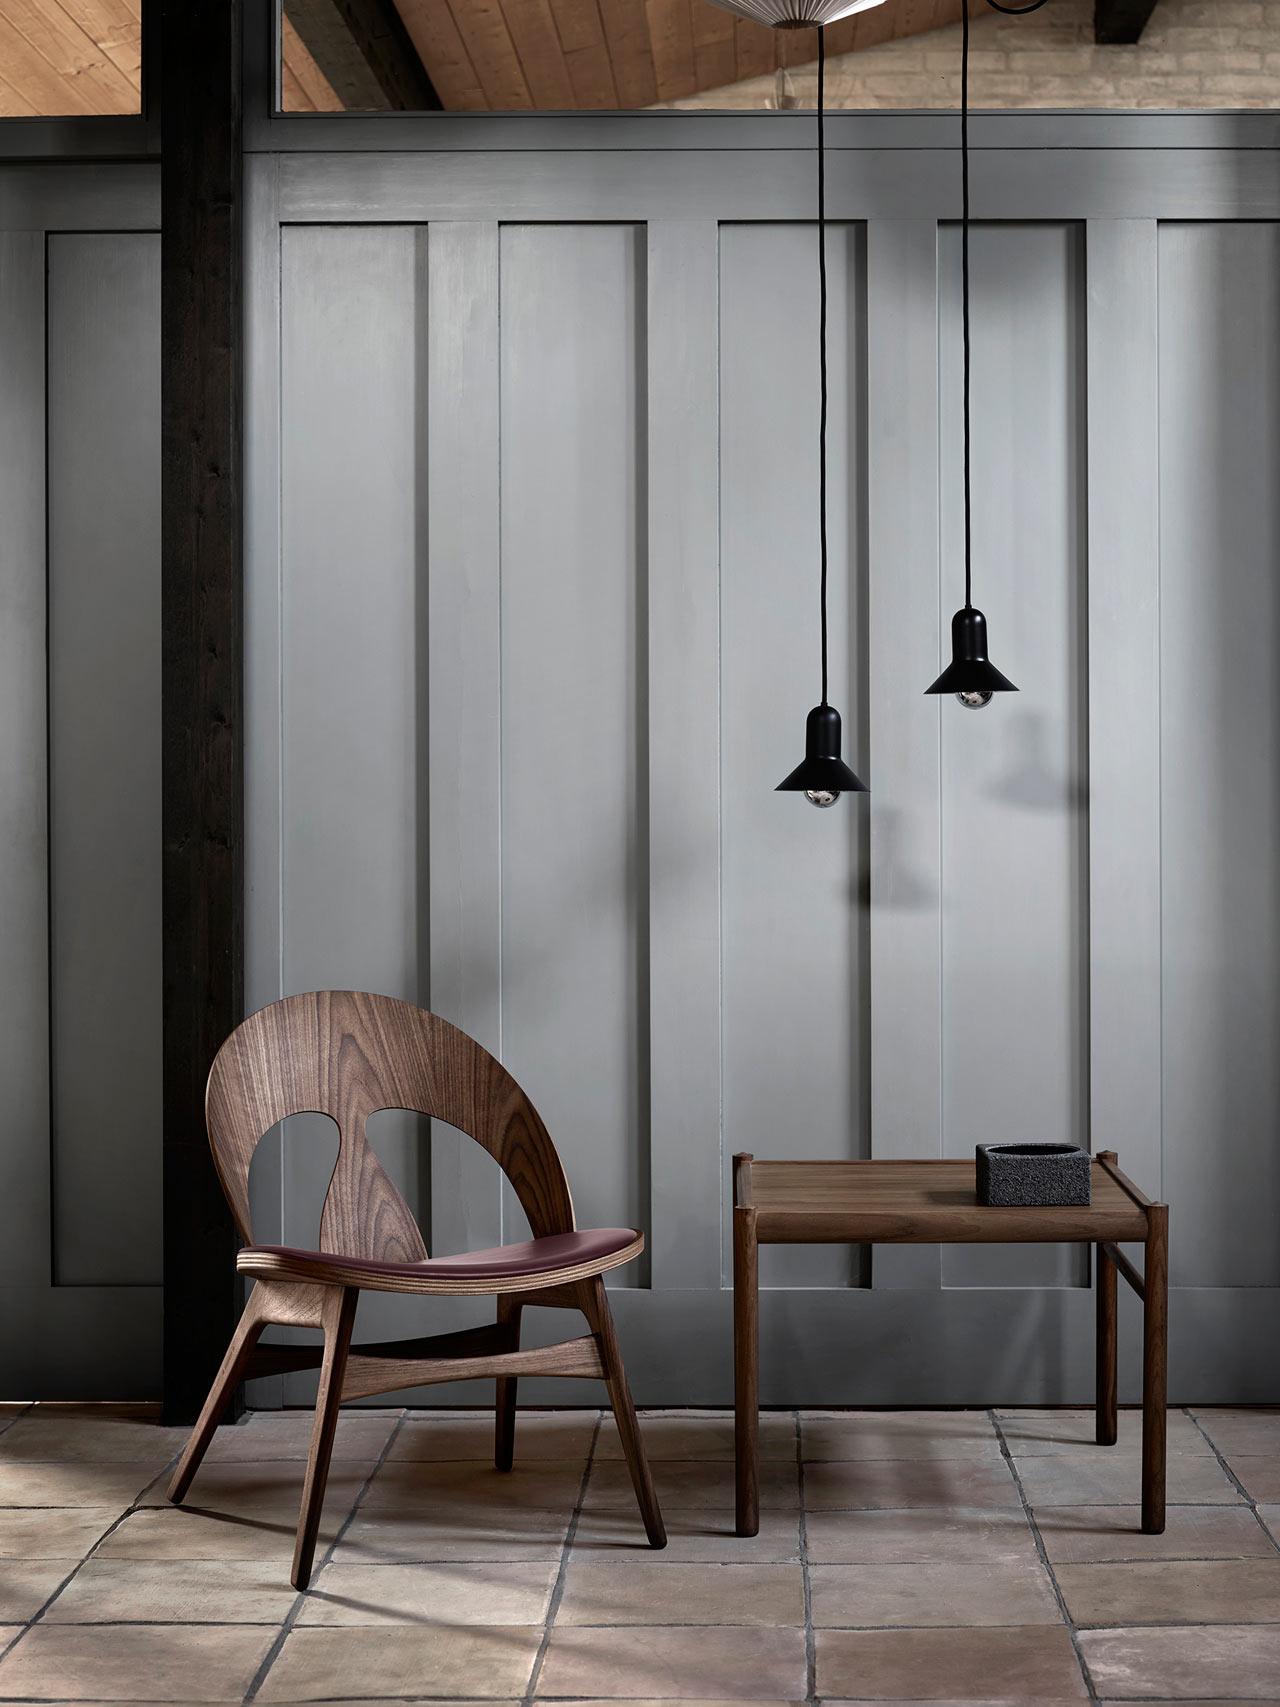 Contour-chair-Mogensen-Carl-Hansen-2.jpg